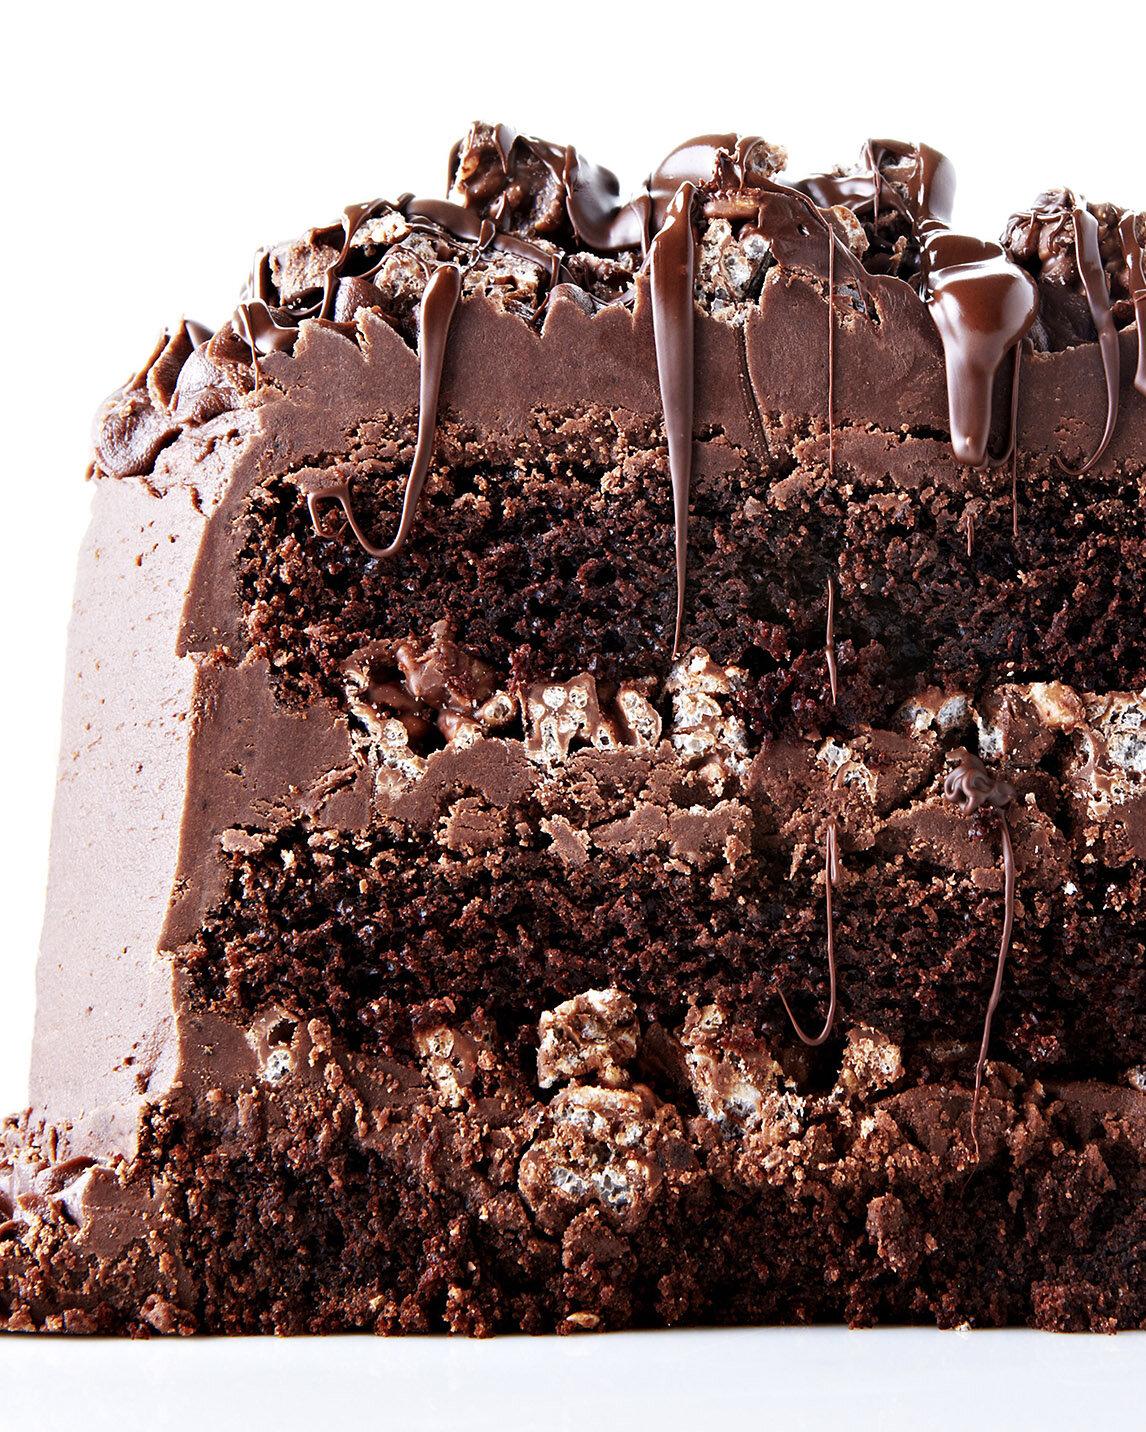 Decadent Chocolate Rice Krispie Crunch Cake Recipe — Bite Me More